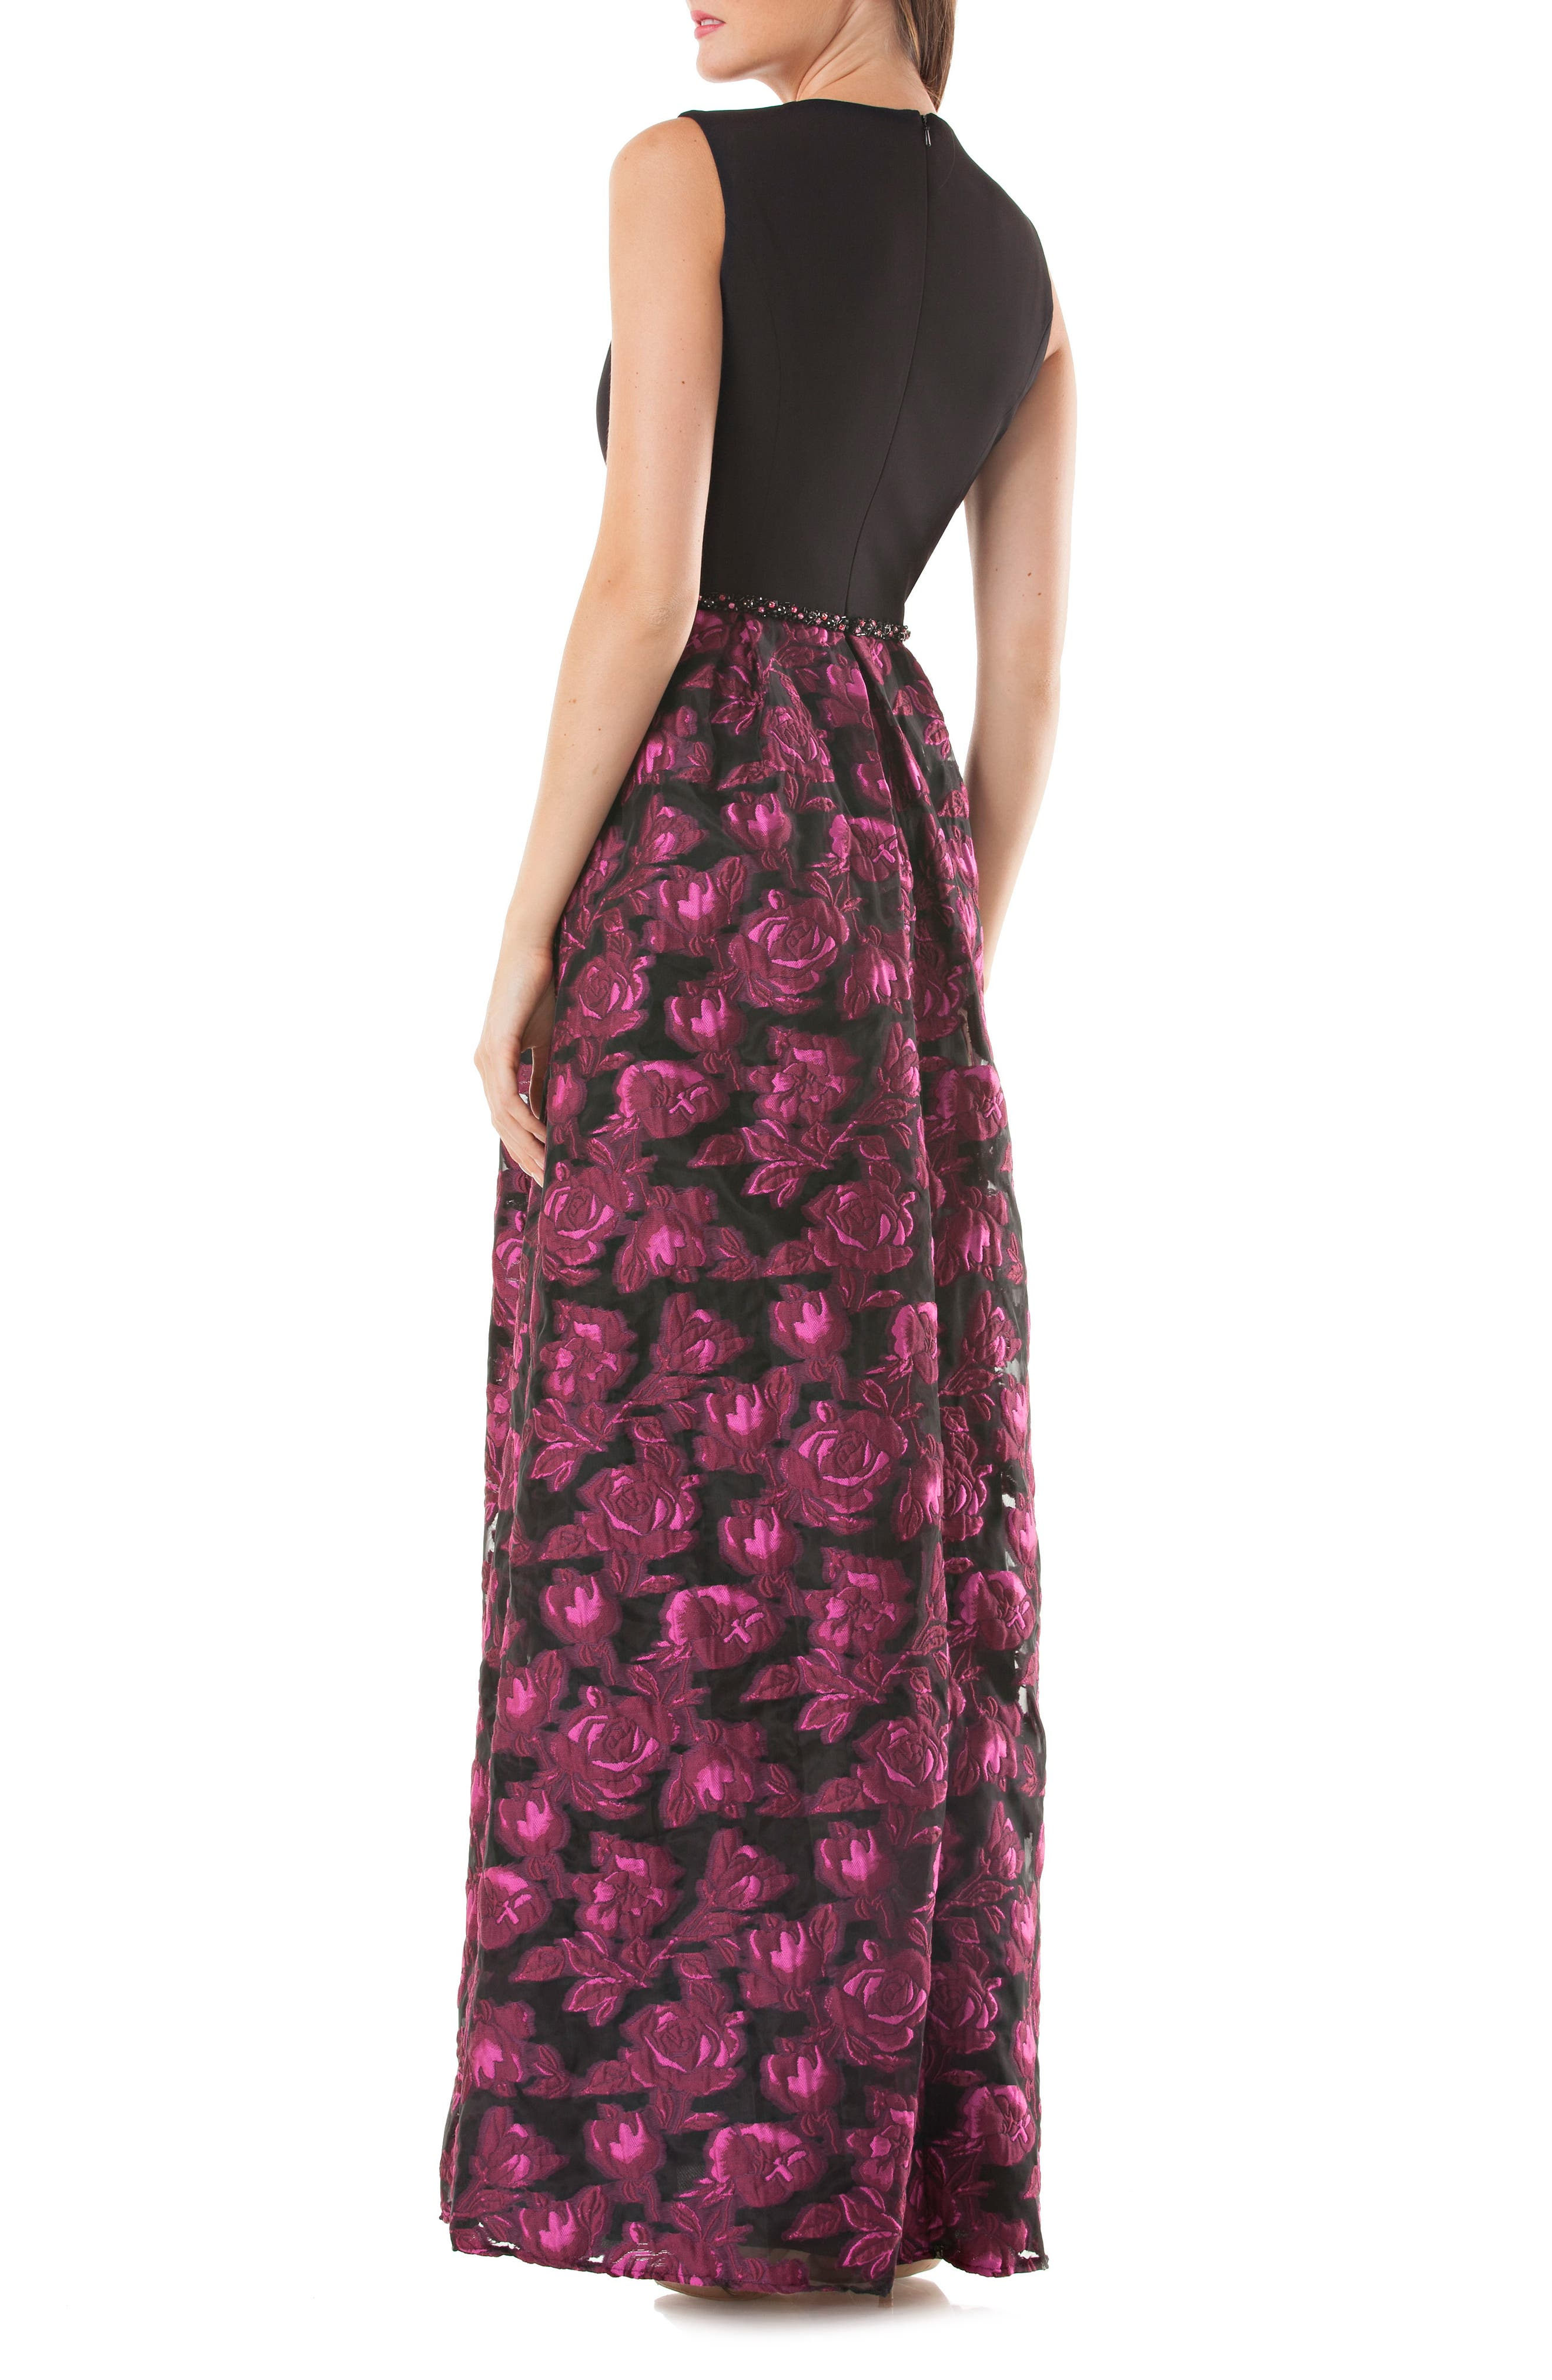 Carmen Marc Valvo Embellished Crepe & Brocade Gown,                             Alternate thumbnail 2, color,                             Black/ Fuchsia